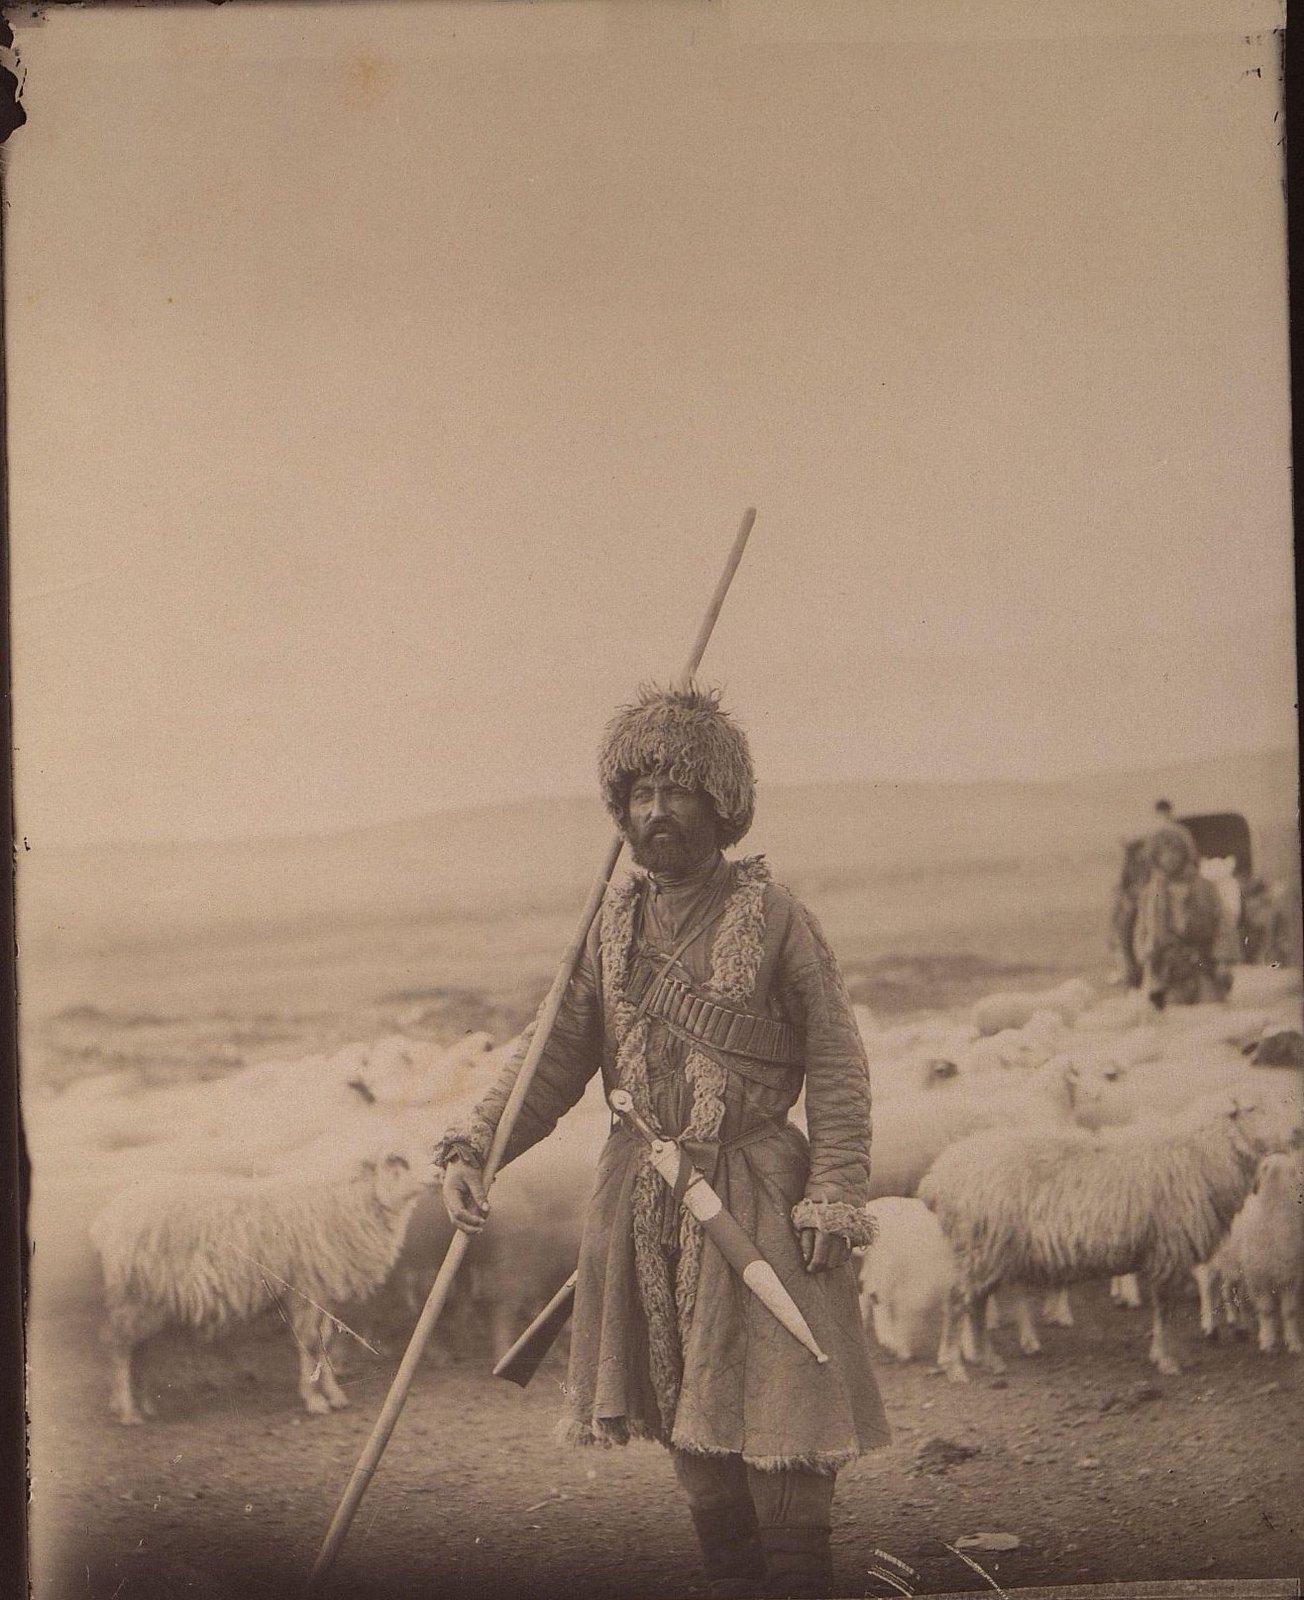 Окрестности Тифлиса. Чабан (пастух-татарин)